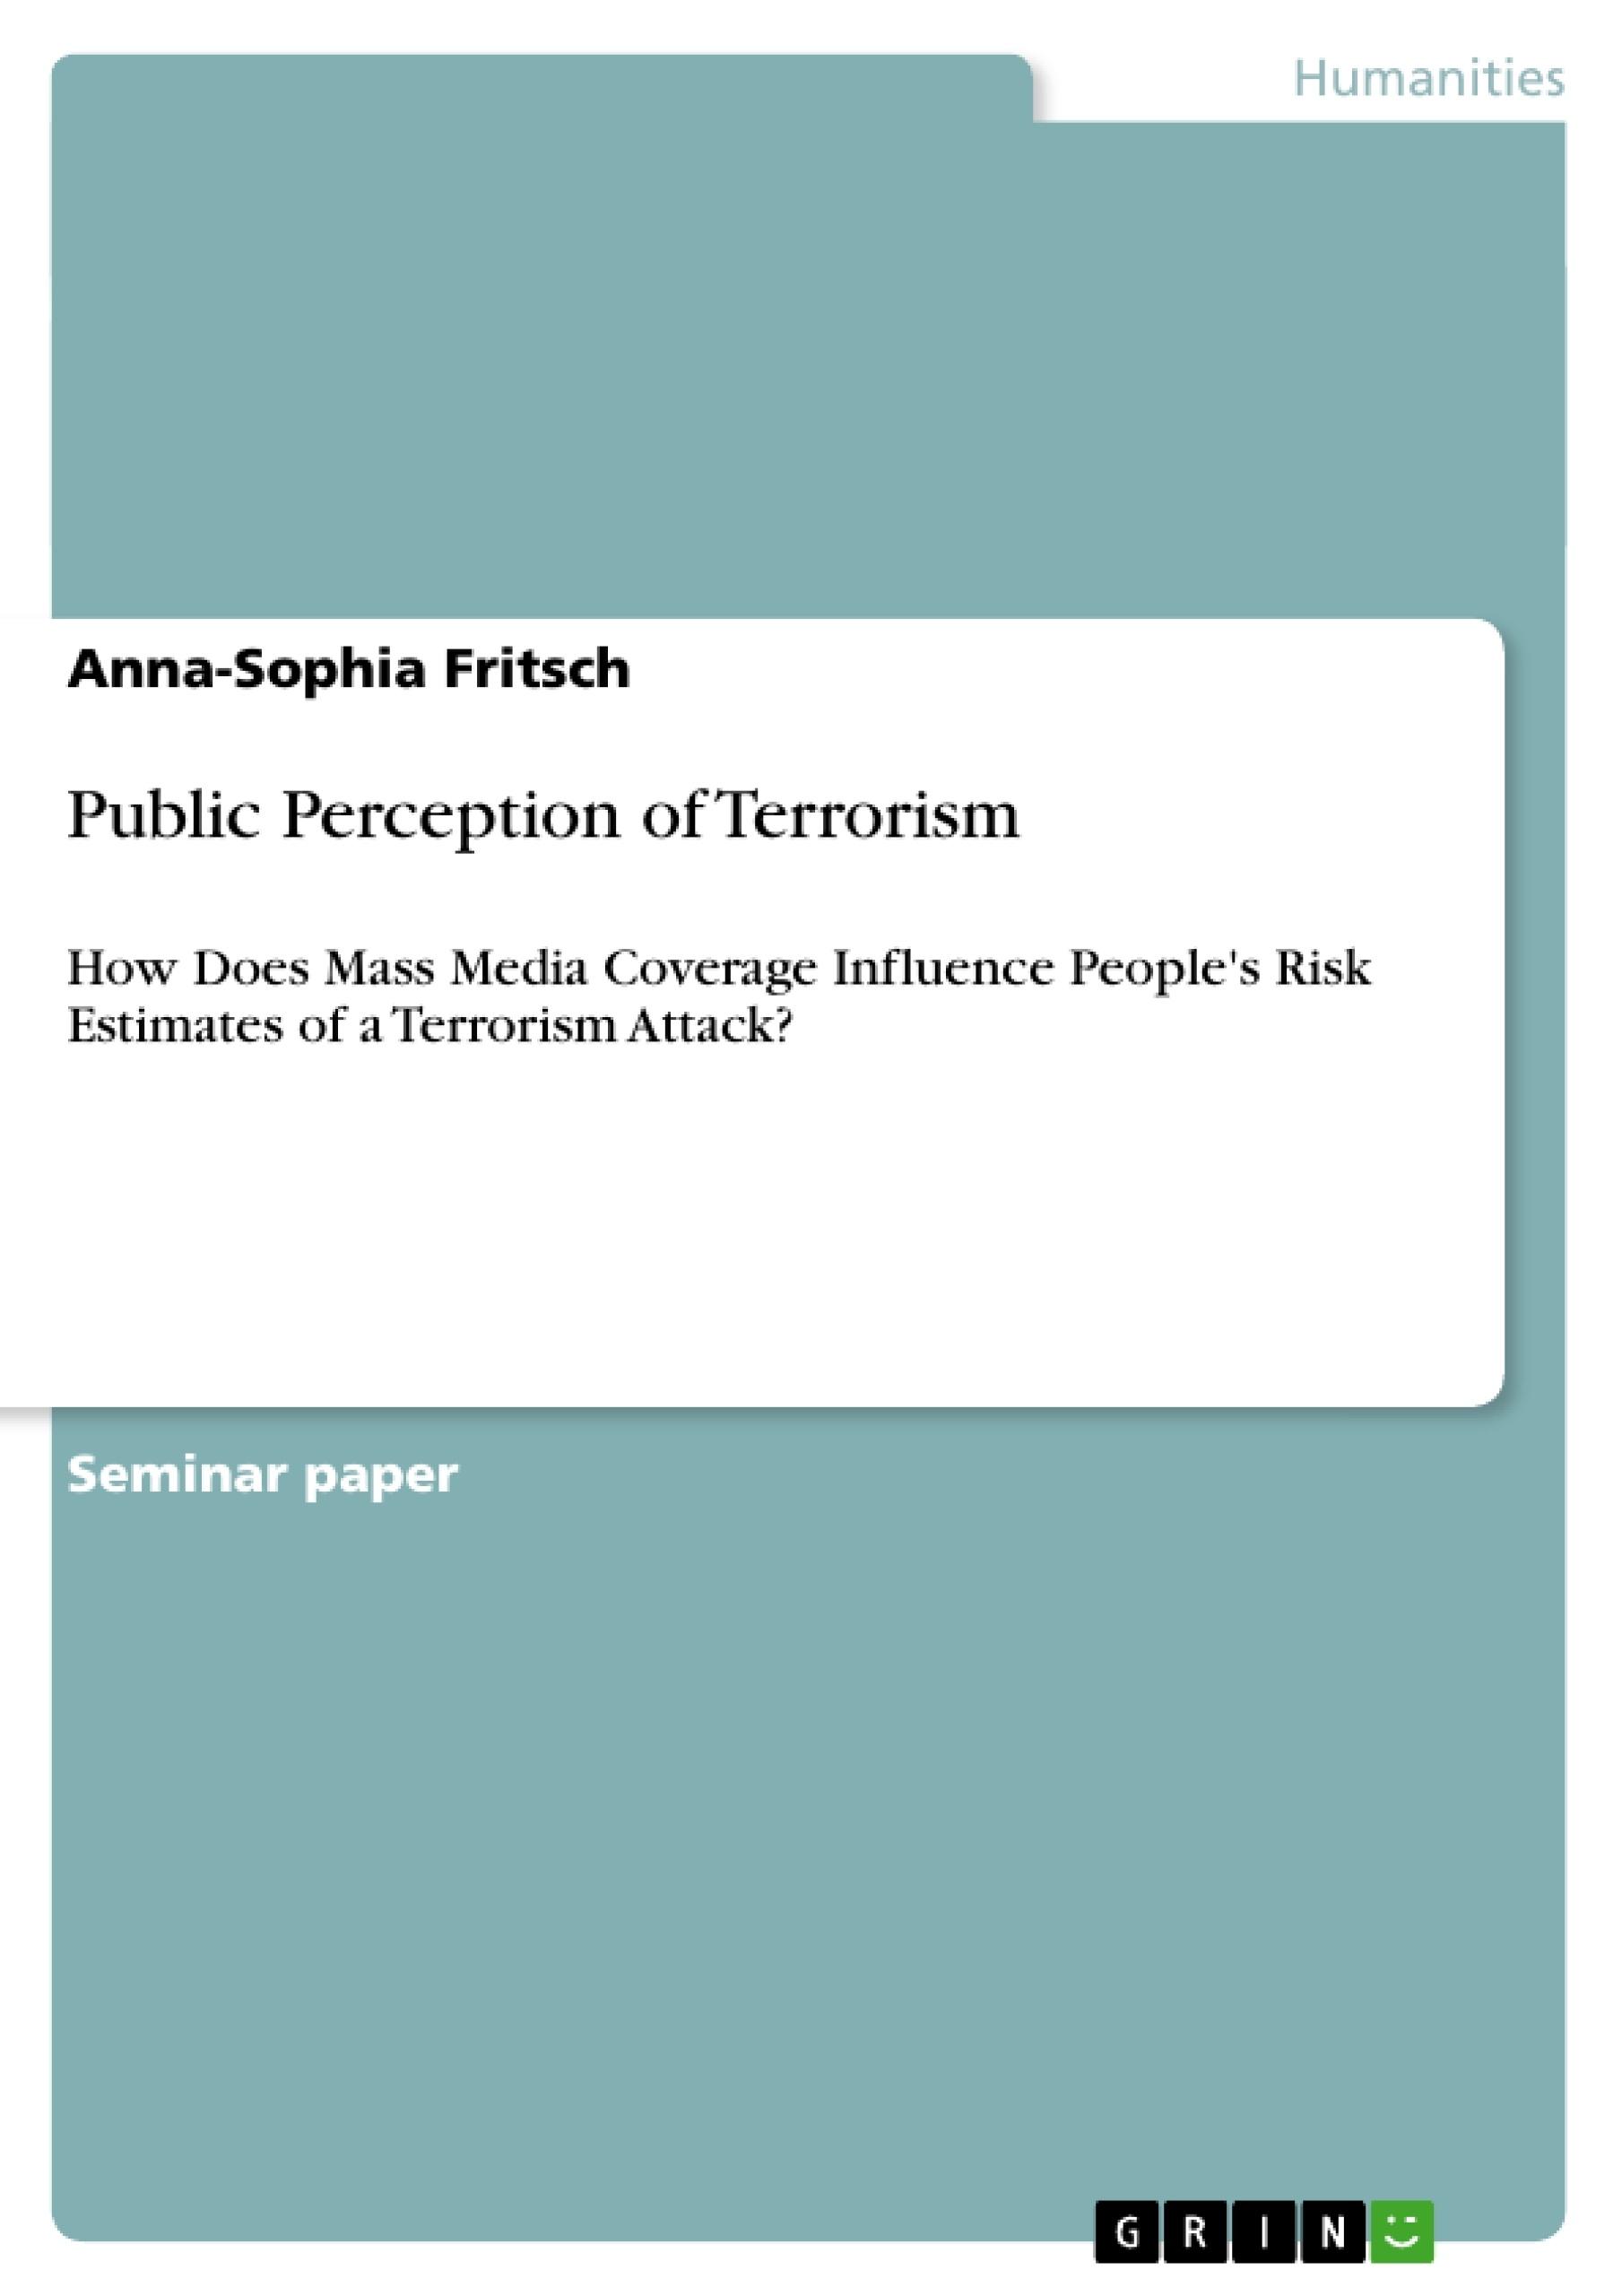 Title: Public Perception of Terrorism